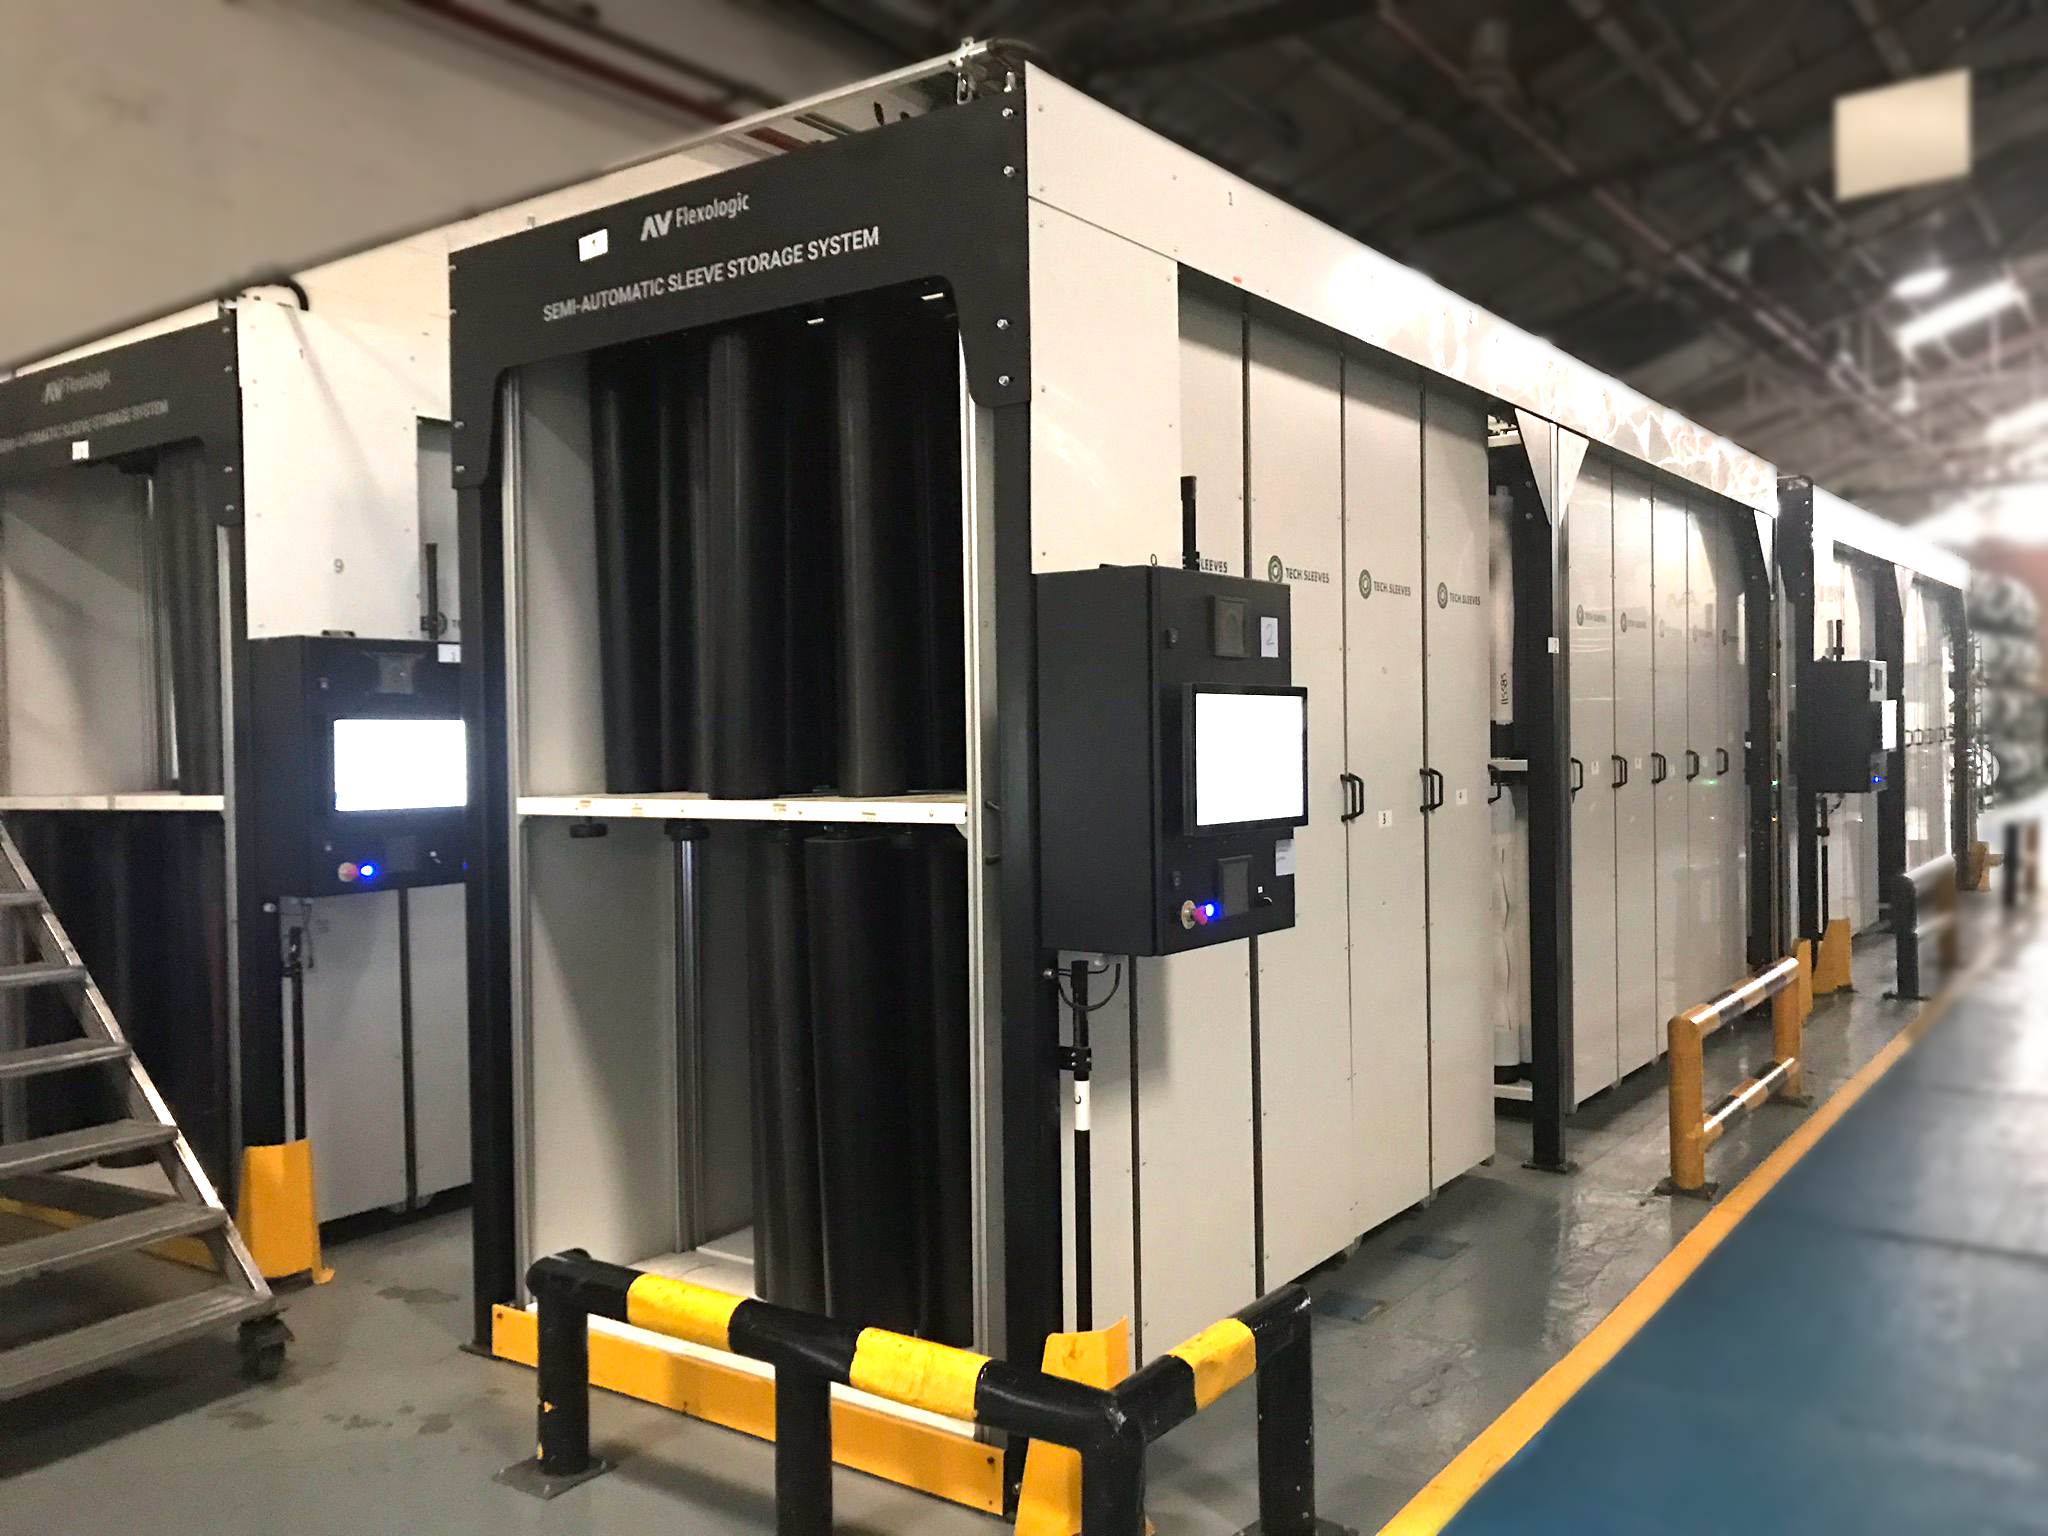 Customized semi-automatic Sleeve Storage System, AV Flexologic